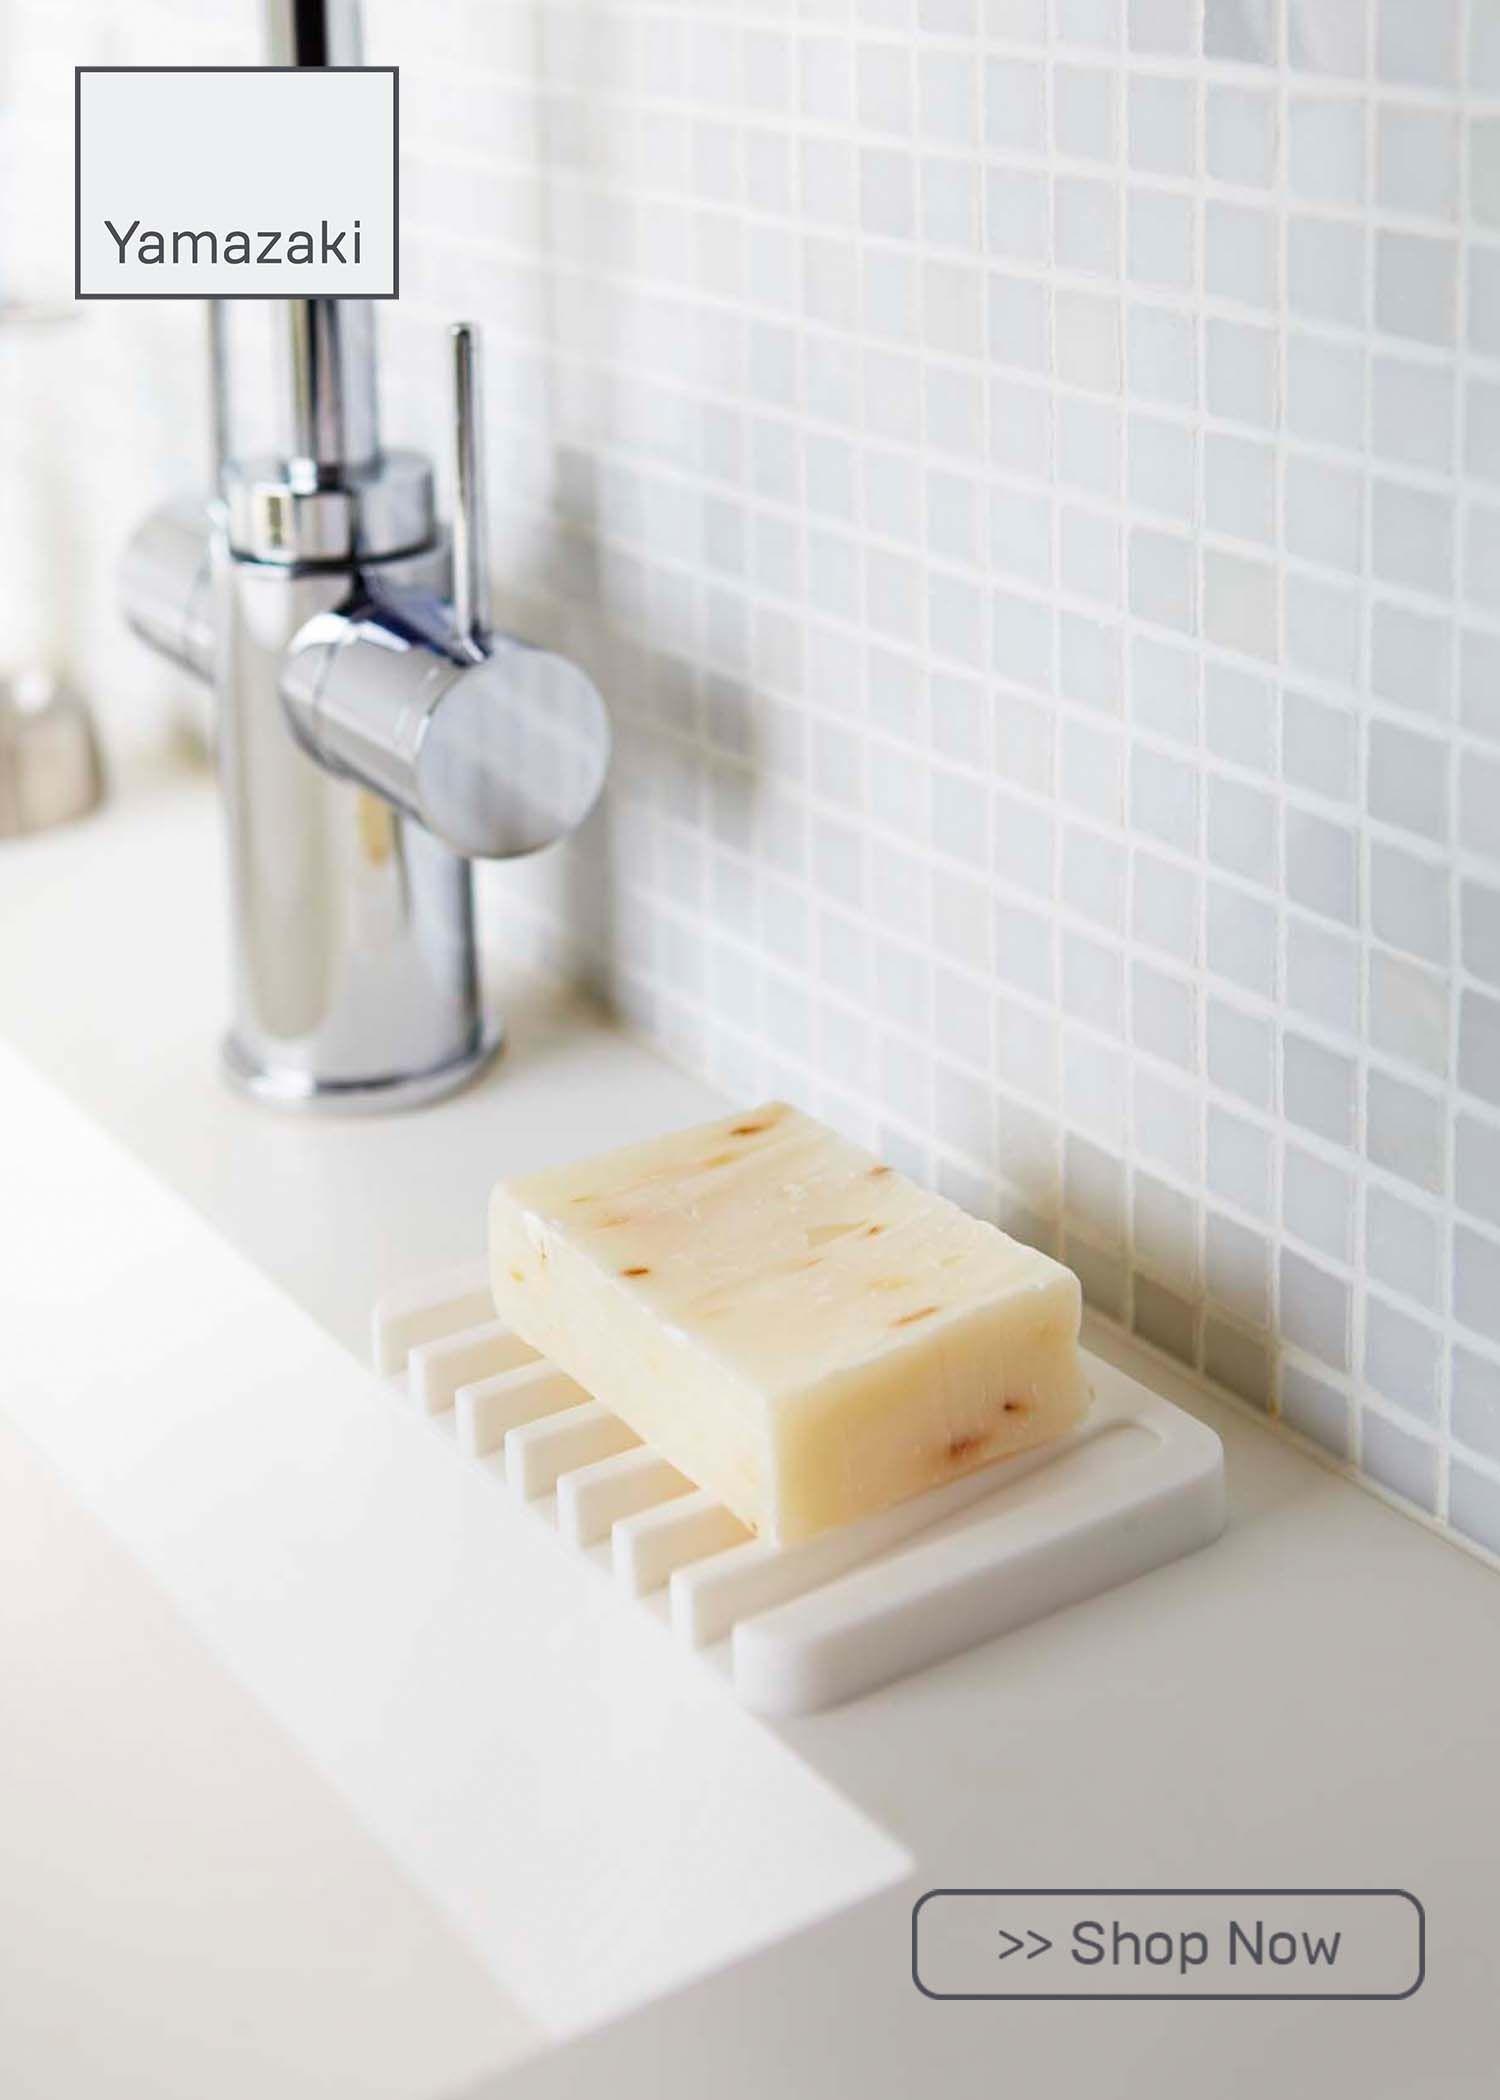 Self Draining Soap Dish Silicone In 2020 Soap Tray Soap Dish Soap